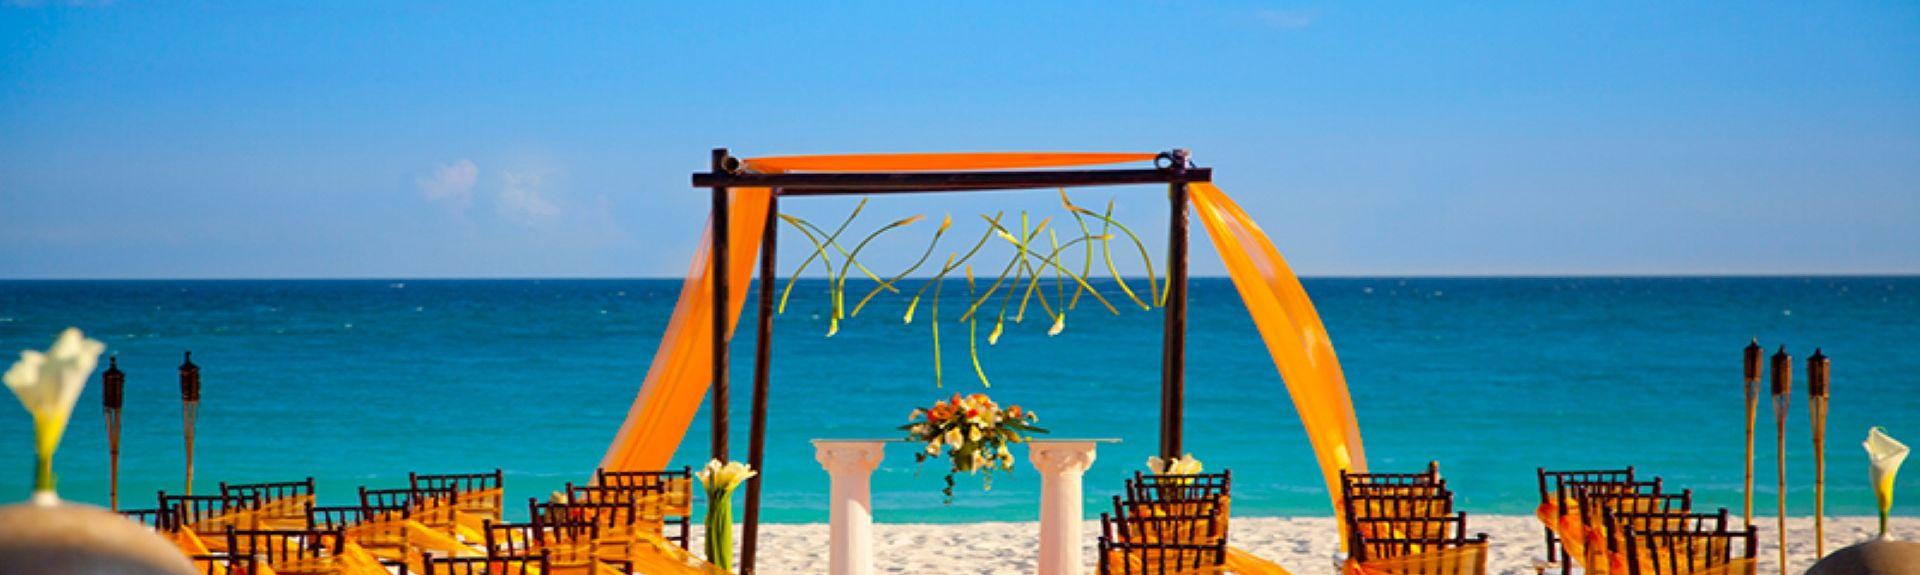 Zona Hotelera, Cancun, Quintana Roo, México